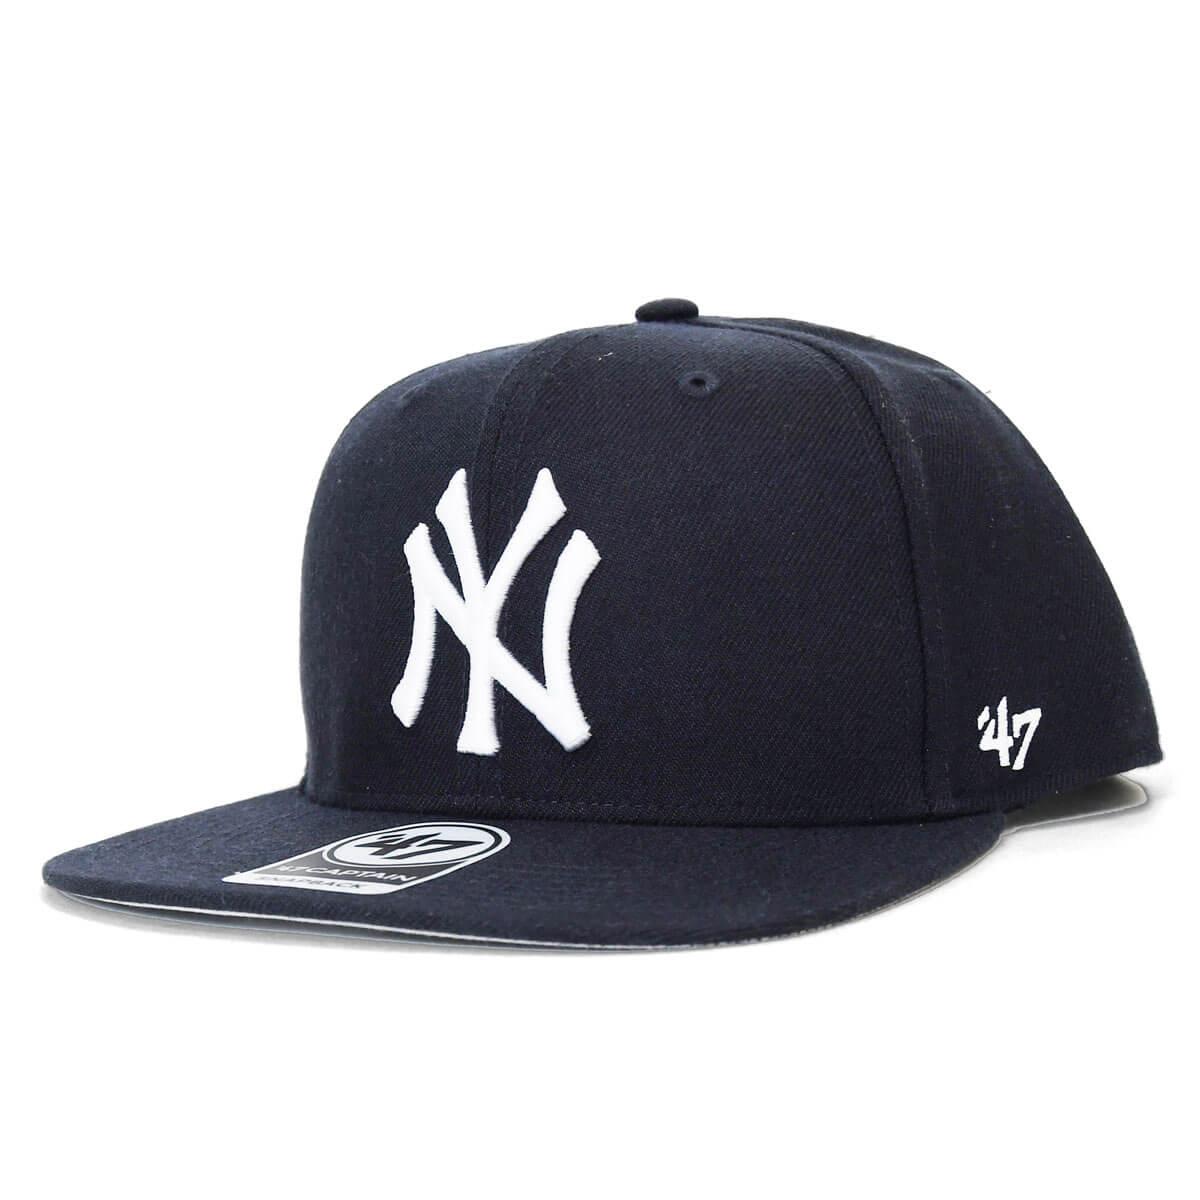 47 Brand 47 ブランド Yankees SURE SHOT 47 CAPTAIN スナップバックキャップ SRS17WBP NAVY ネイビー